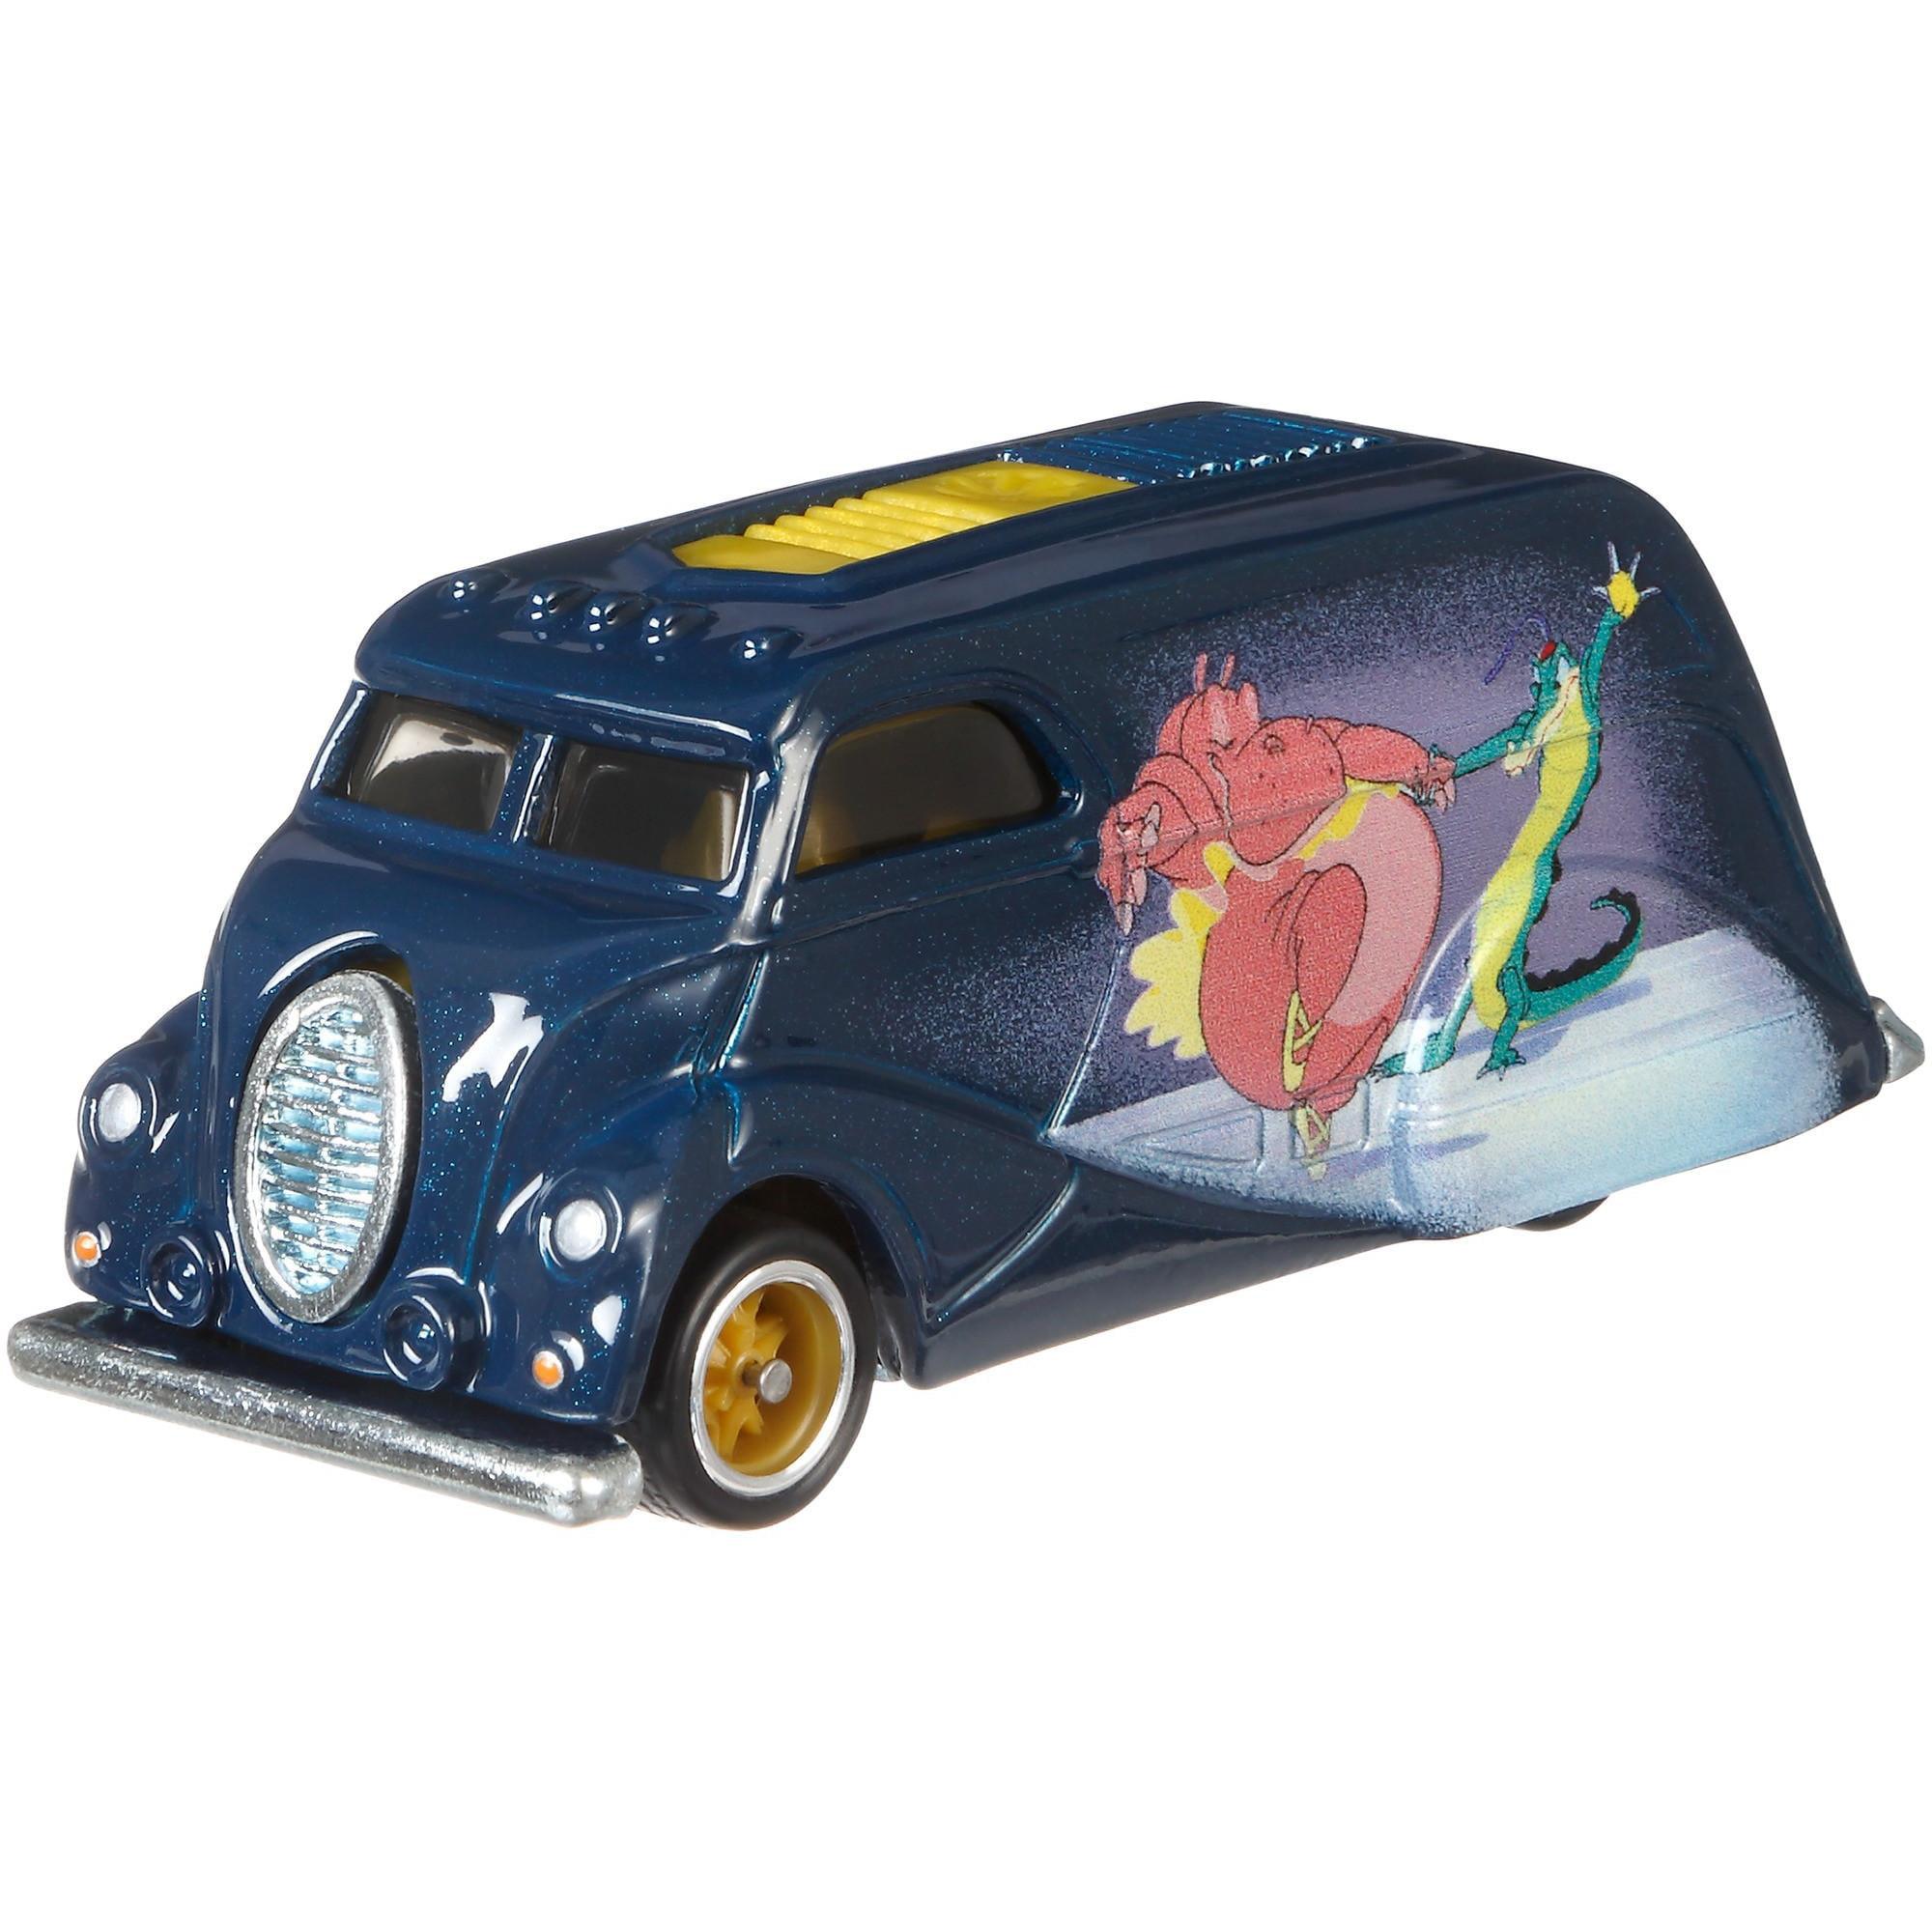 Hot Wheels Premium 1:64 Scale Disney's Fantasia Die-cast Delivery Vehicle by Mattel